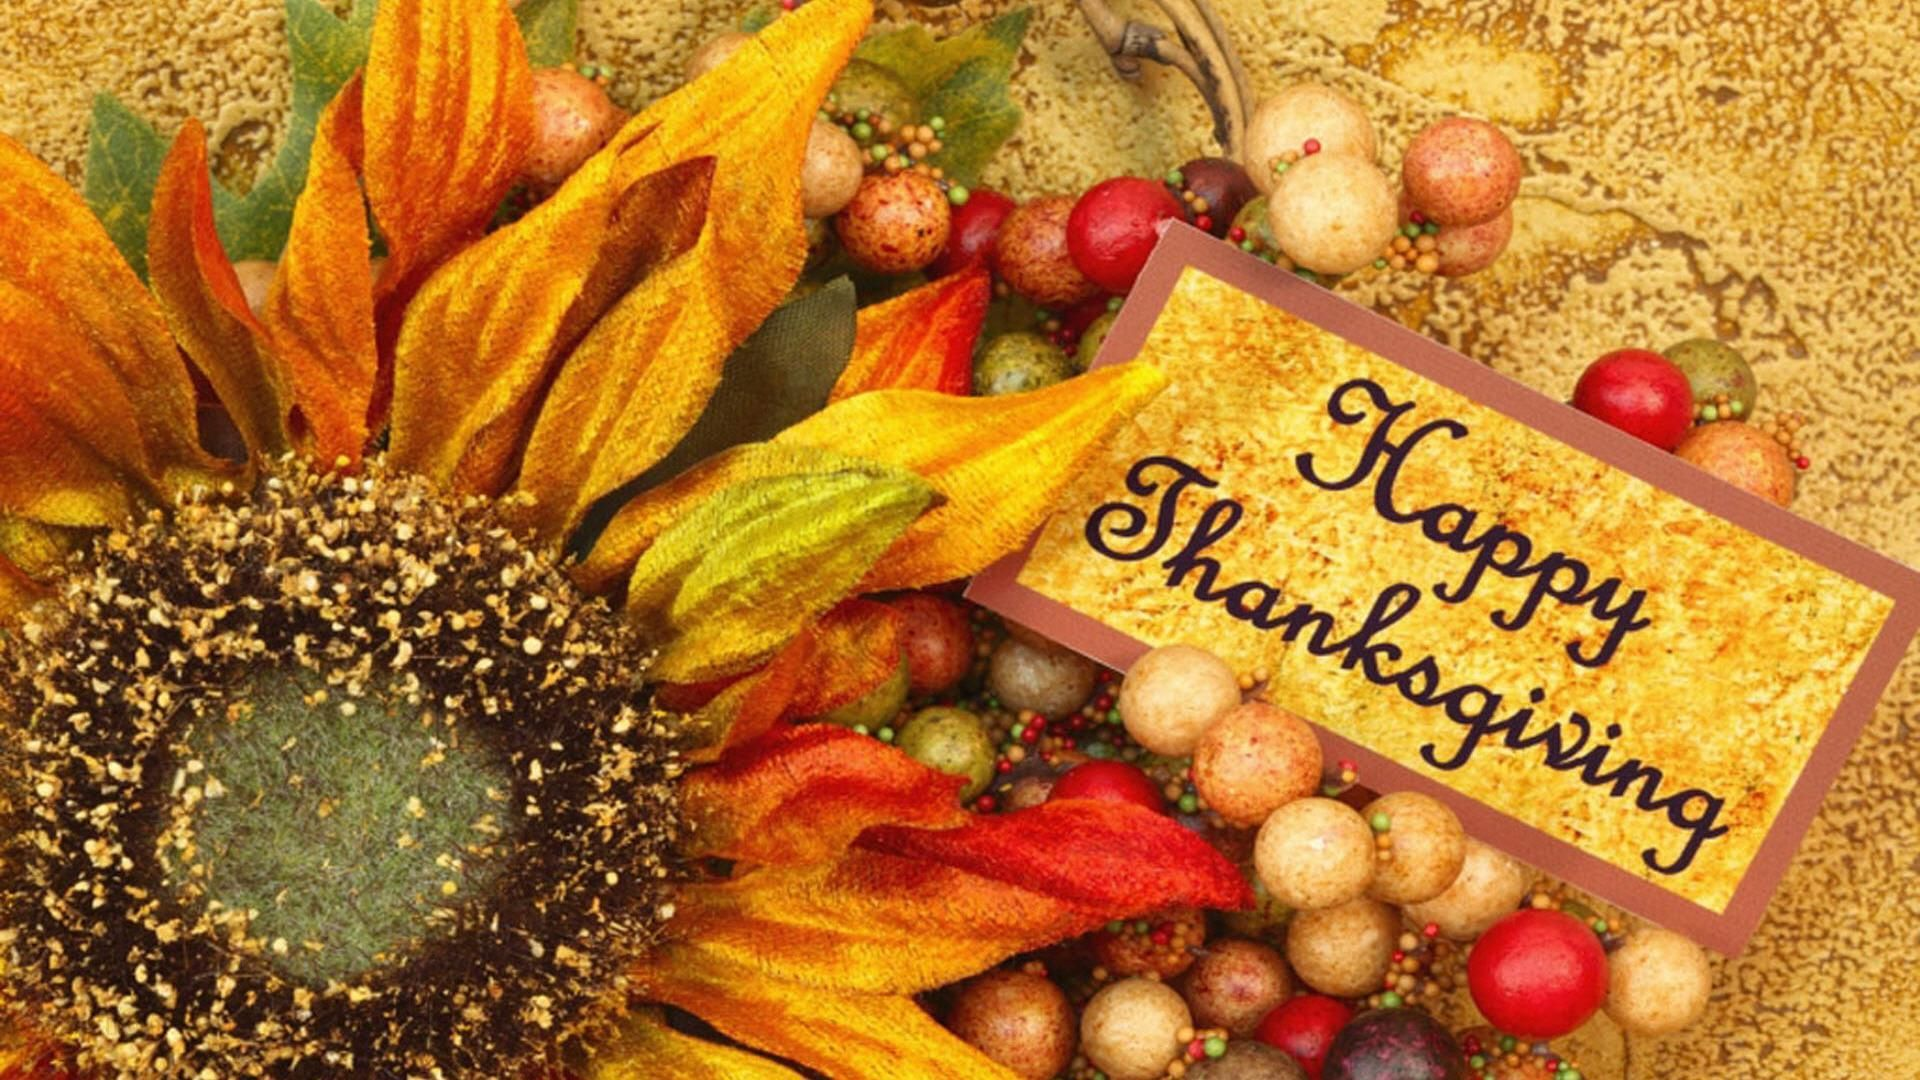 happy thanksgiving - photo #12